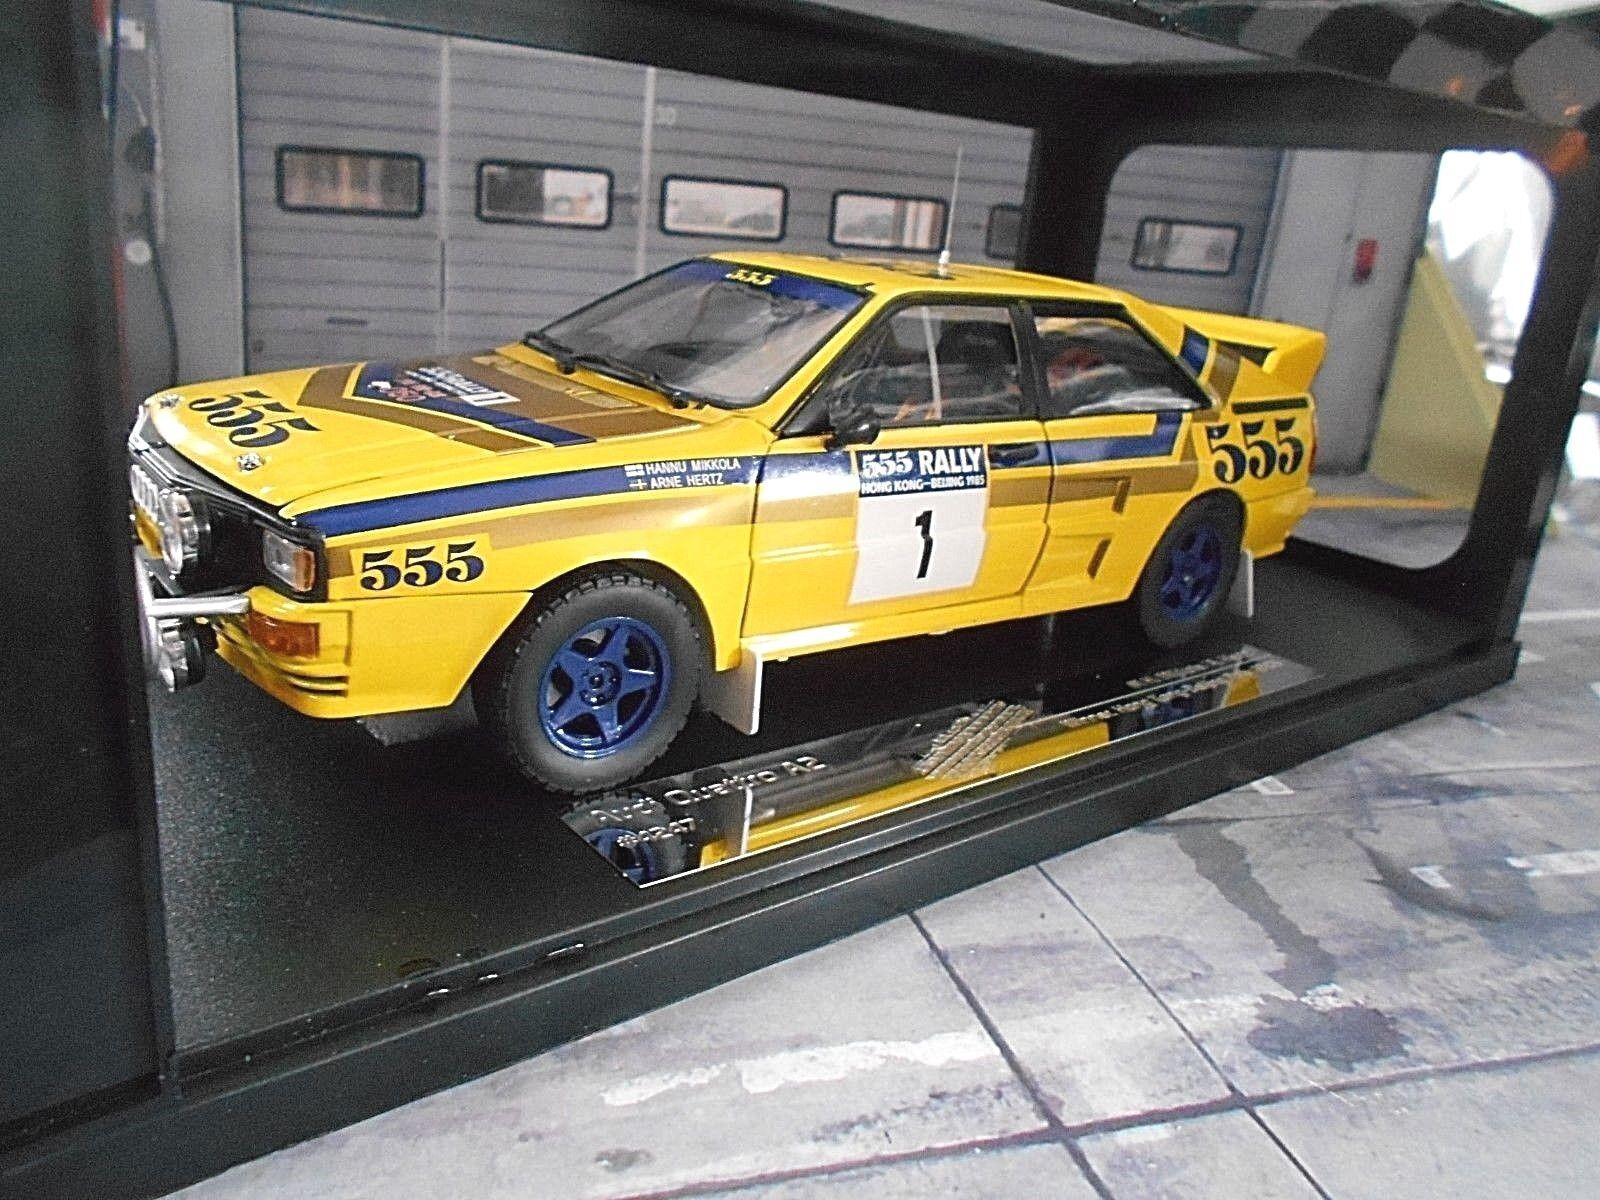 AUDI Quattro Rallye Gr.B 555 Hongkong Peking 1985  1 Mikkola Hertz Sunstar 1 18